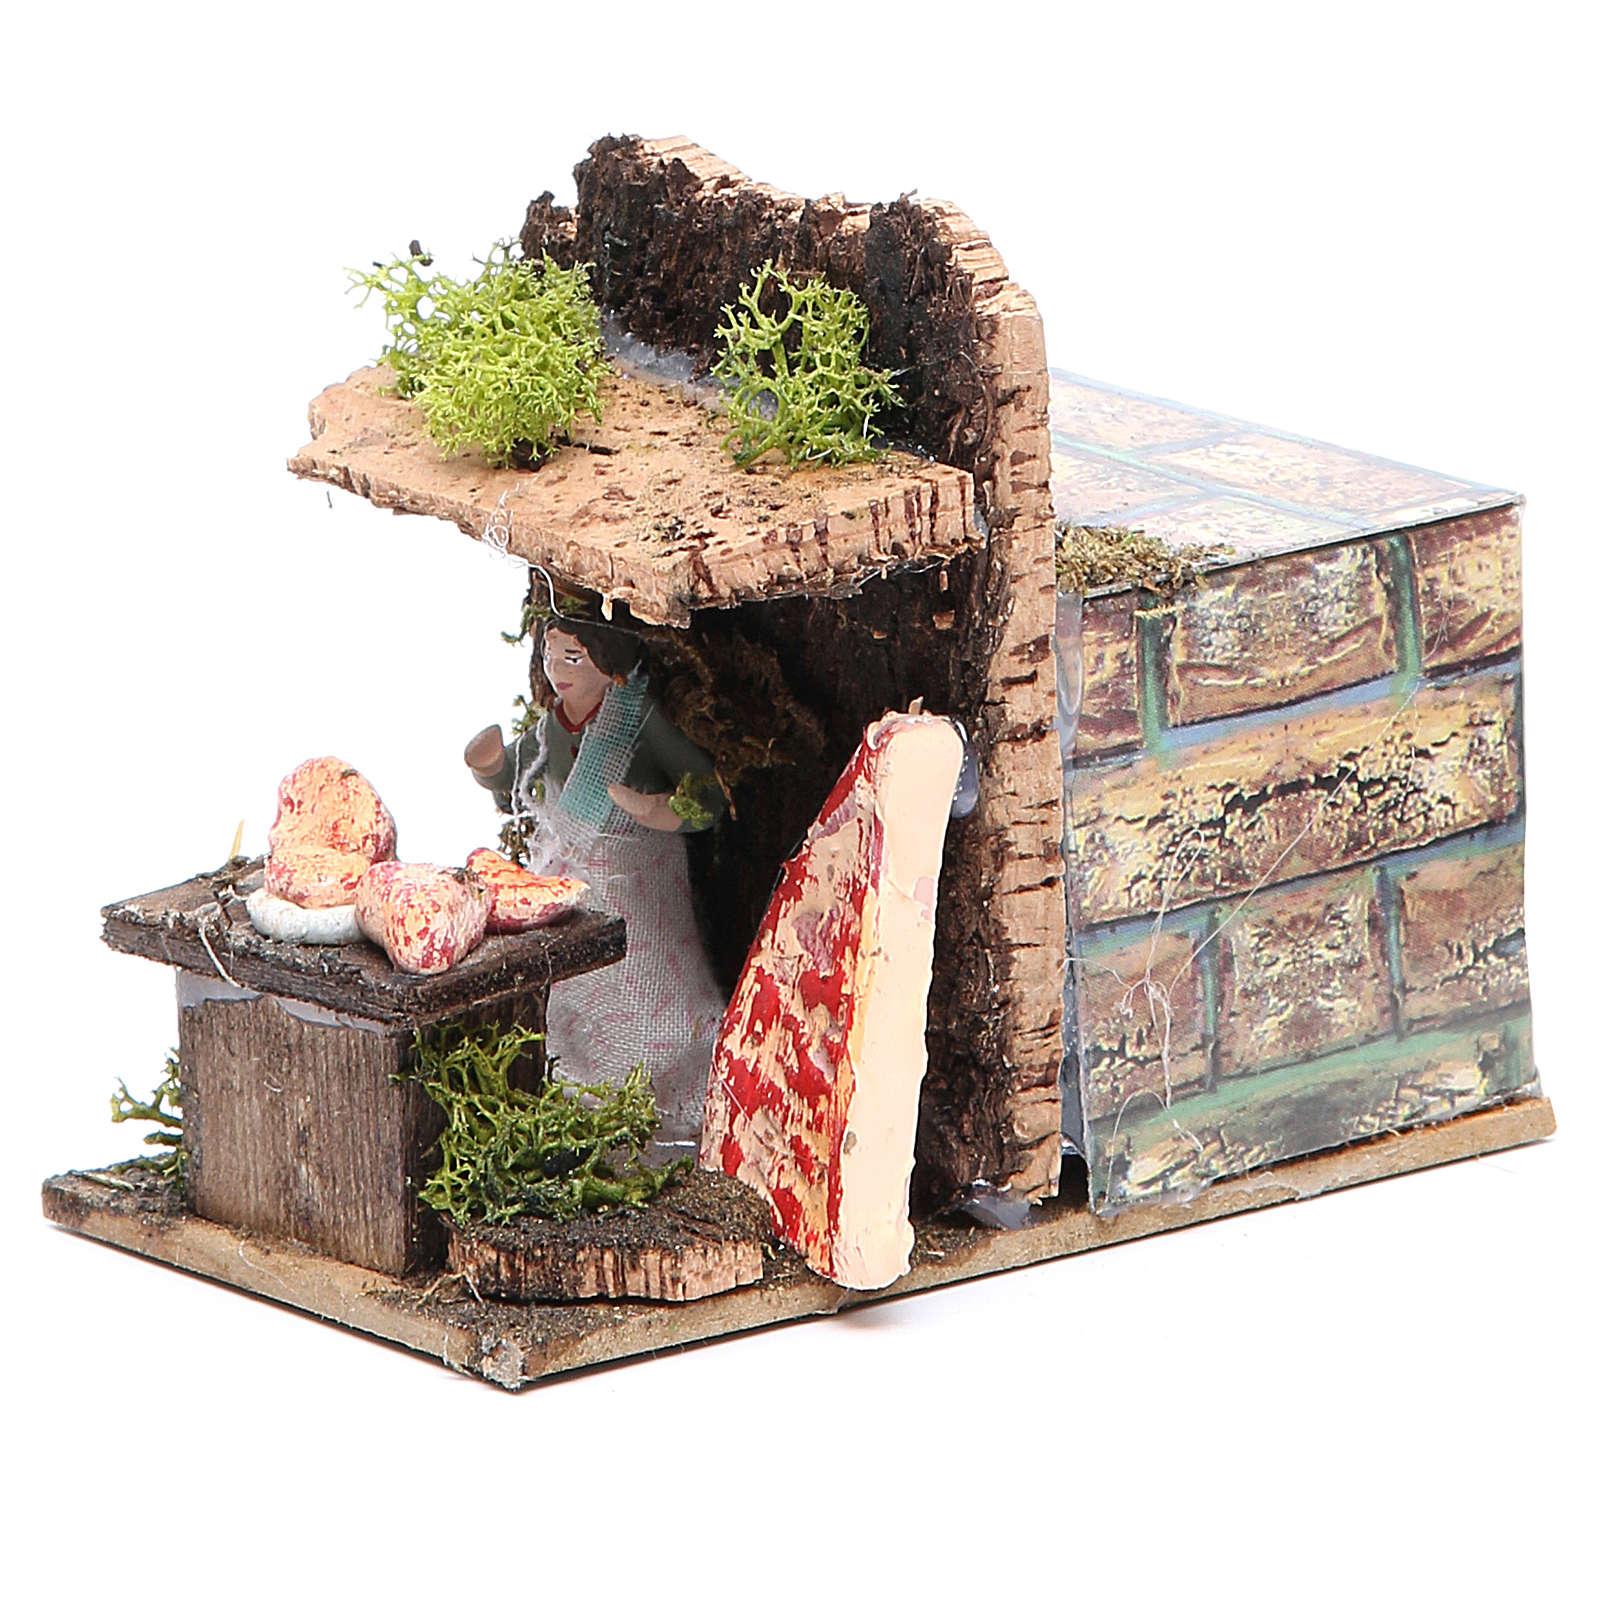 Butcher measuring 4cm, animated nativity figurine 3